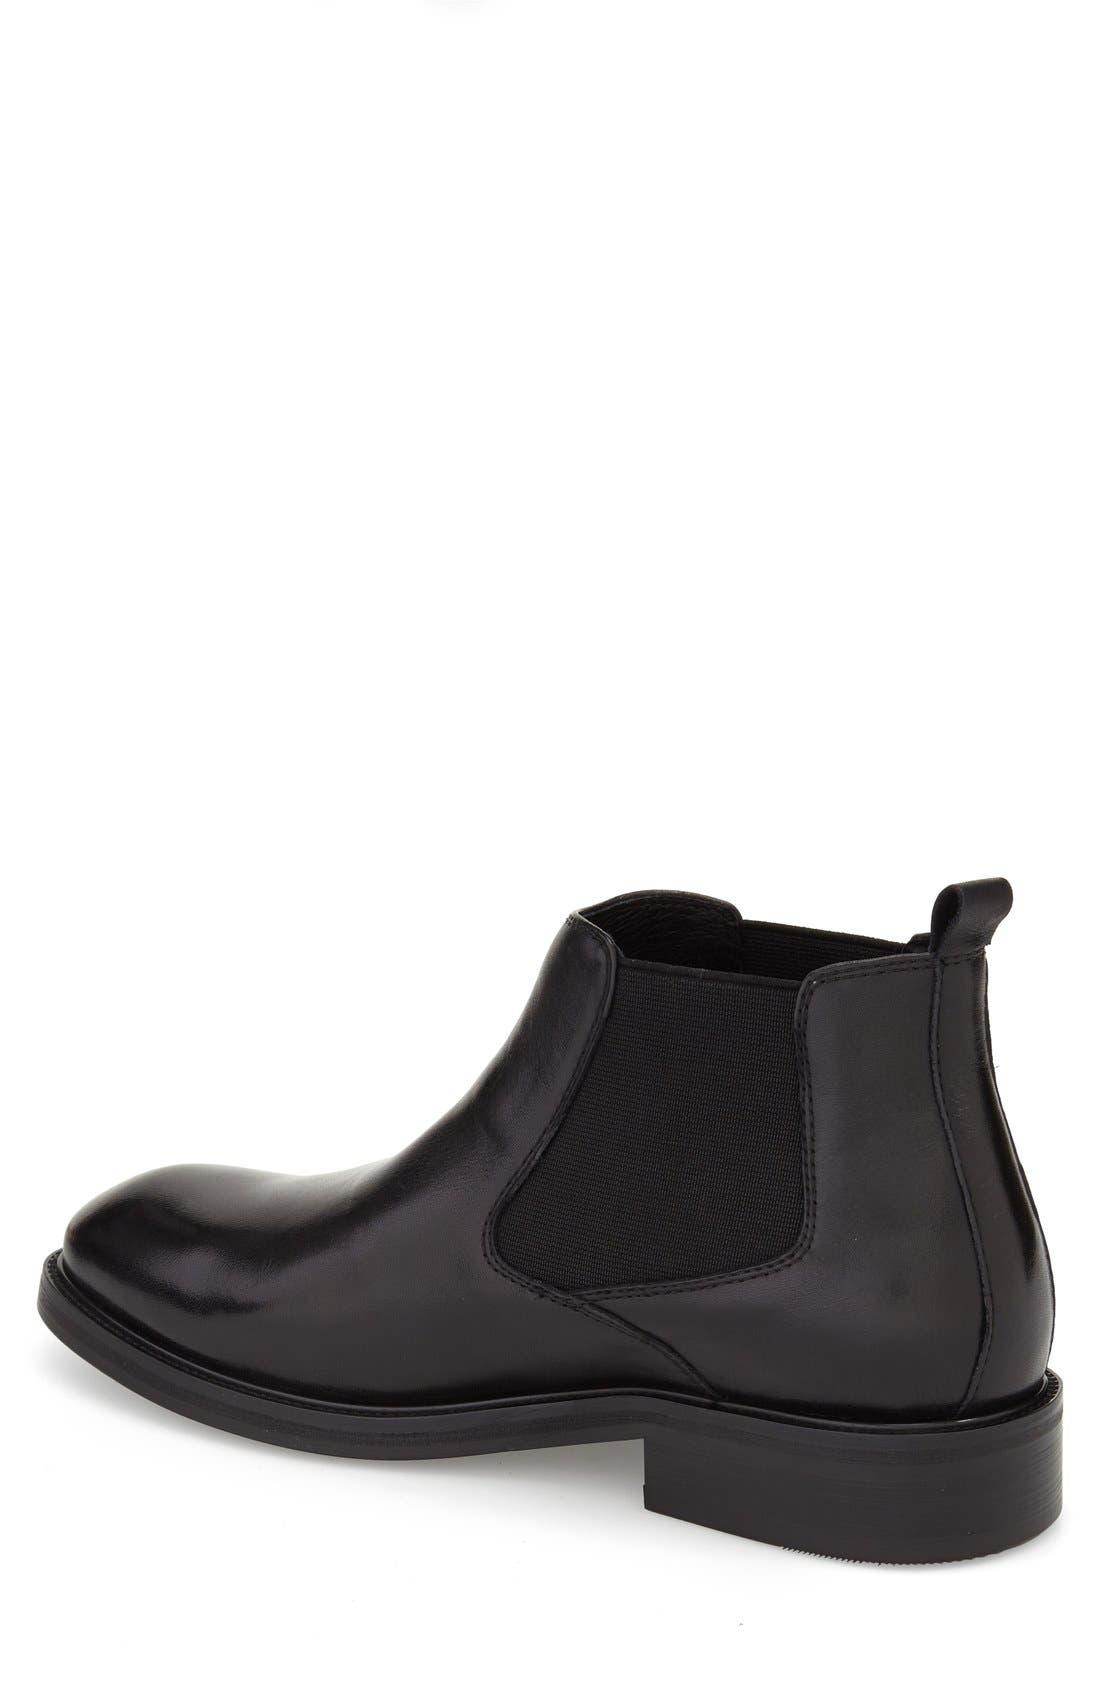 Alternate Image 2  - Zanzara 'Napoli' Double Monk Strap Shoe (Men)